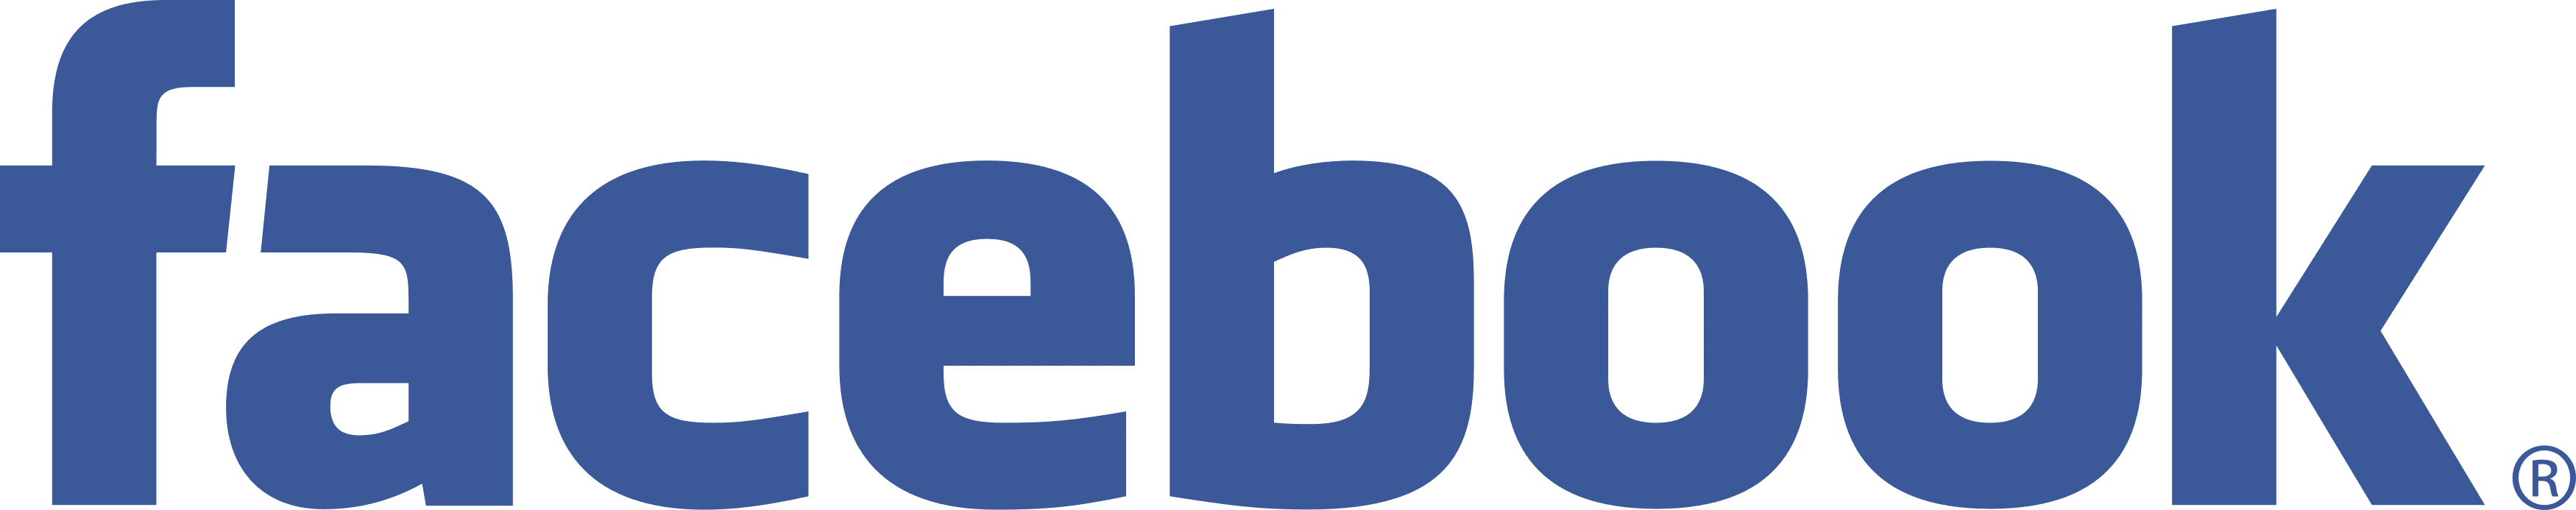 Facebook-Logo-PNG12